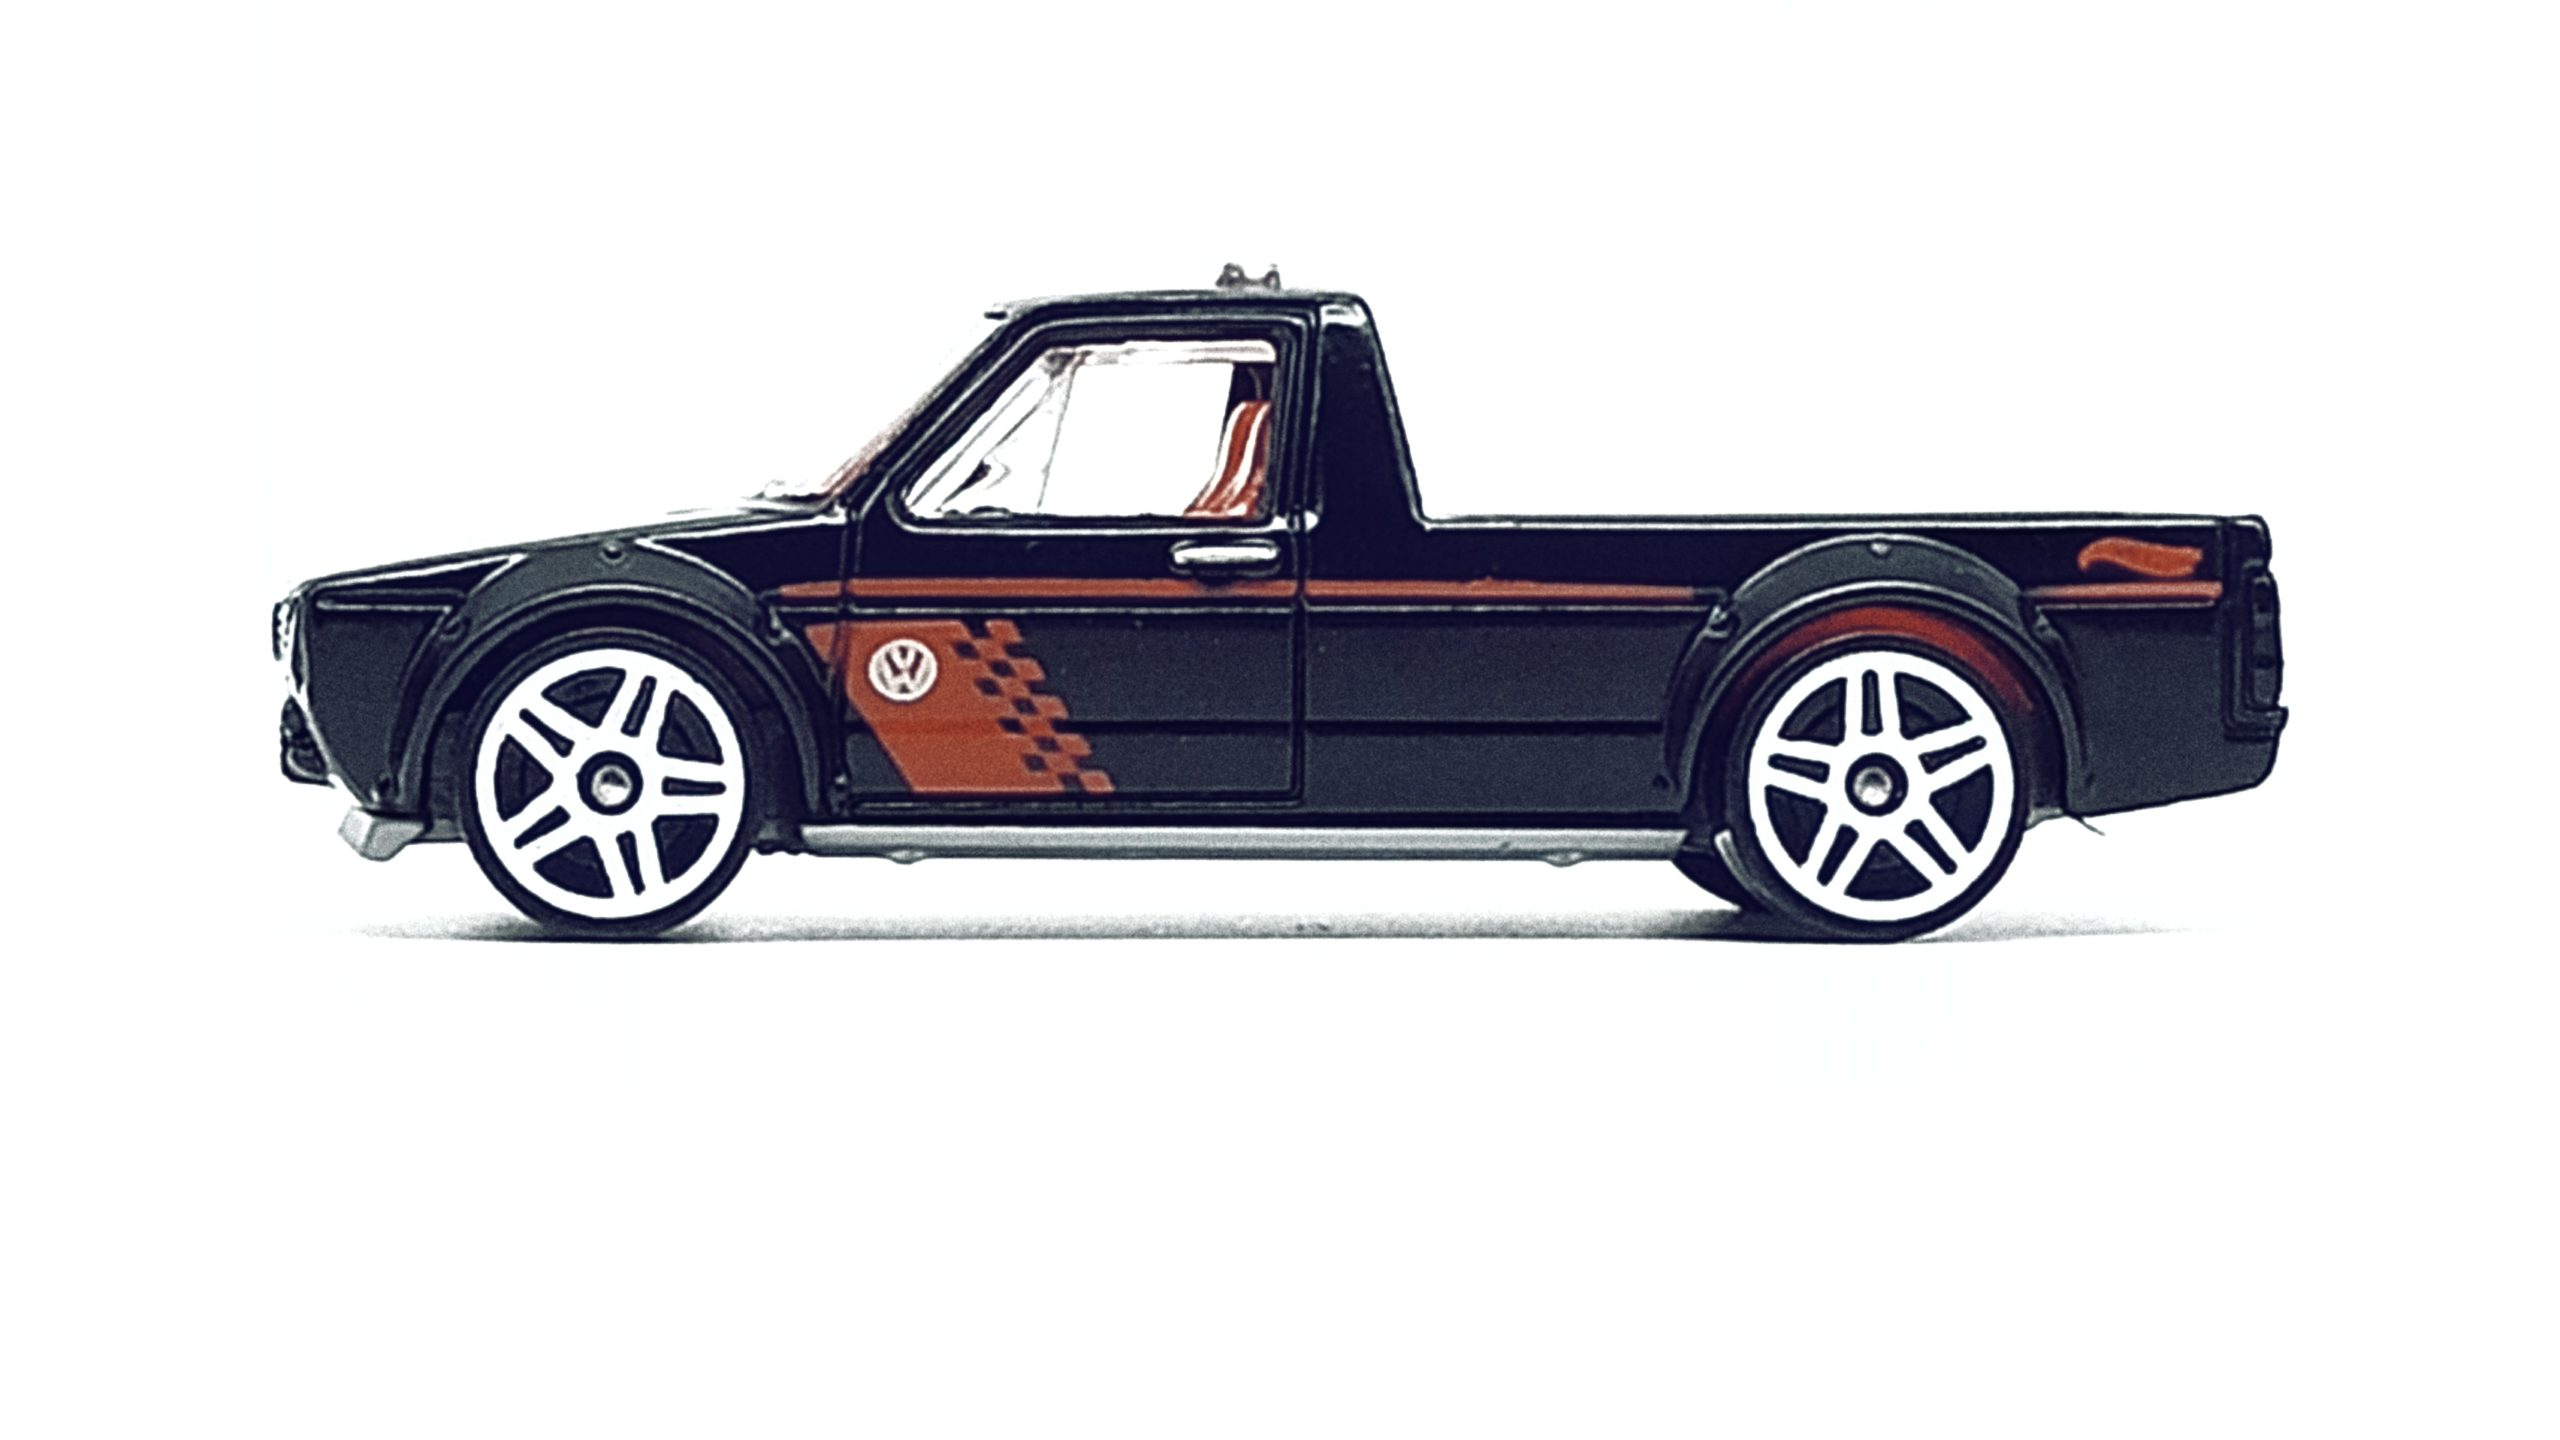 Hot Wheels Volkswagen Caddy (FYG73) 2019 (177/250) Target Red Edition (12/12) VW black side